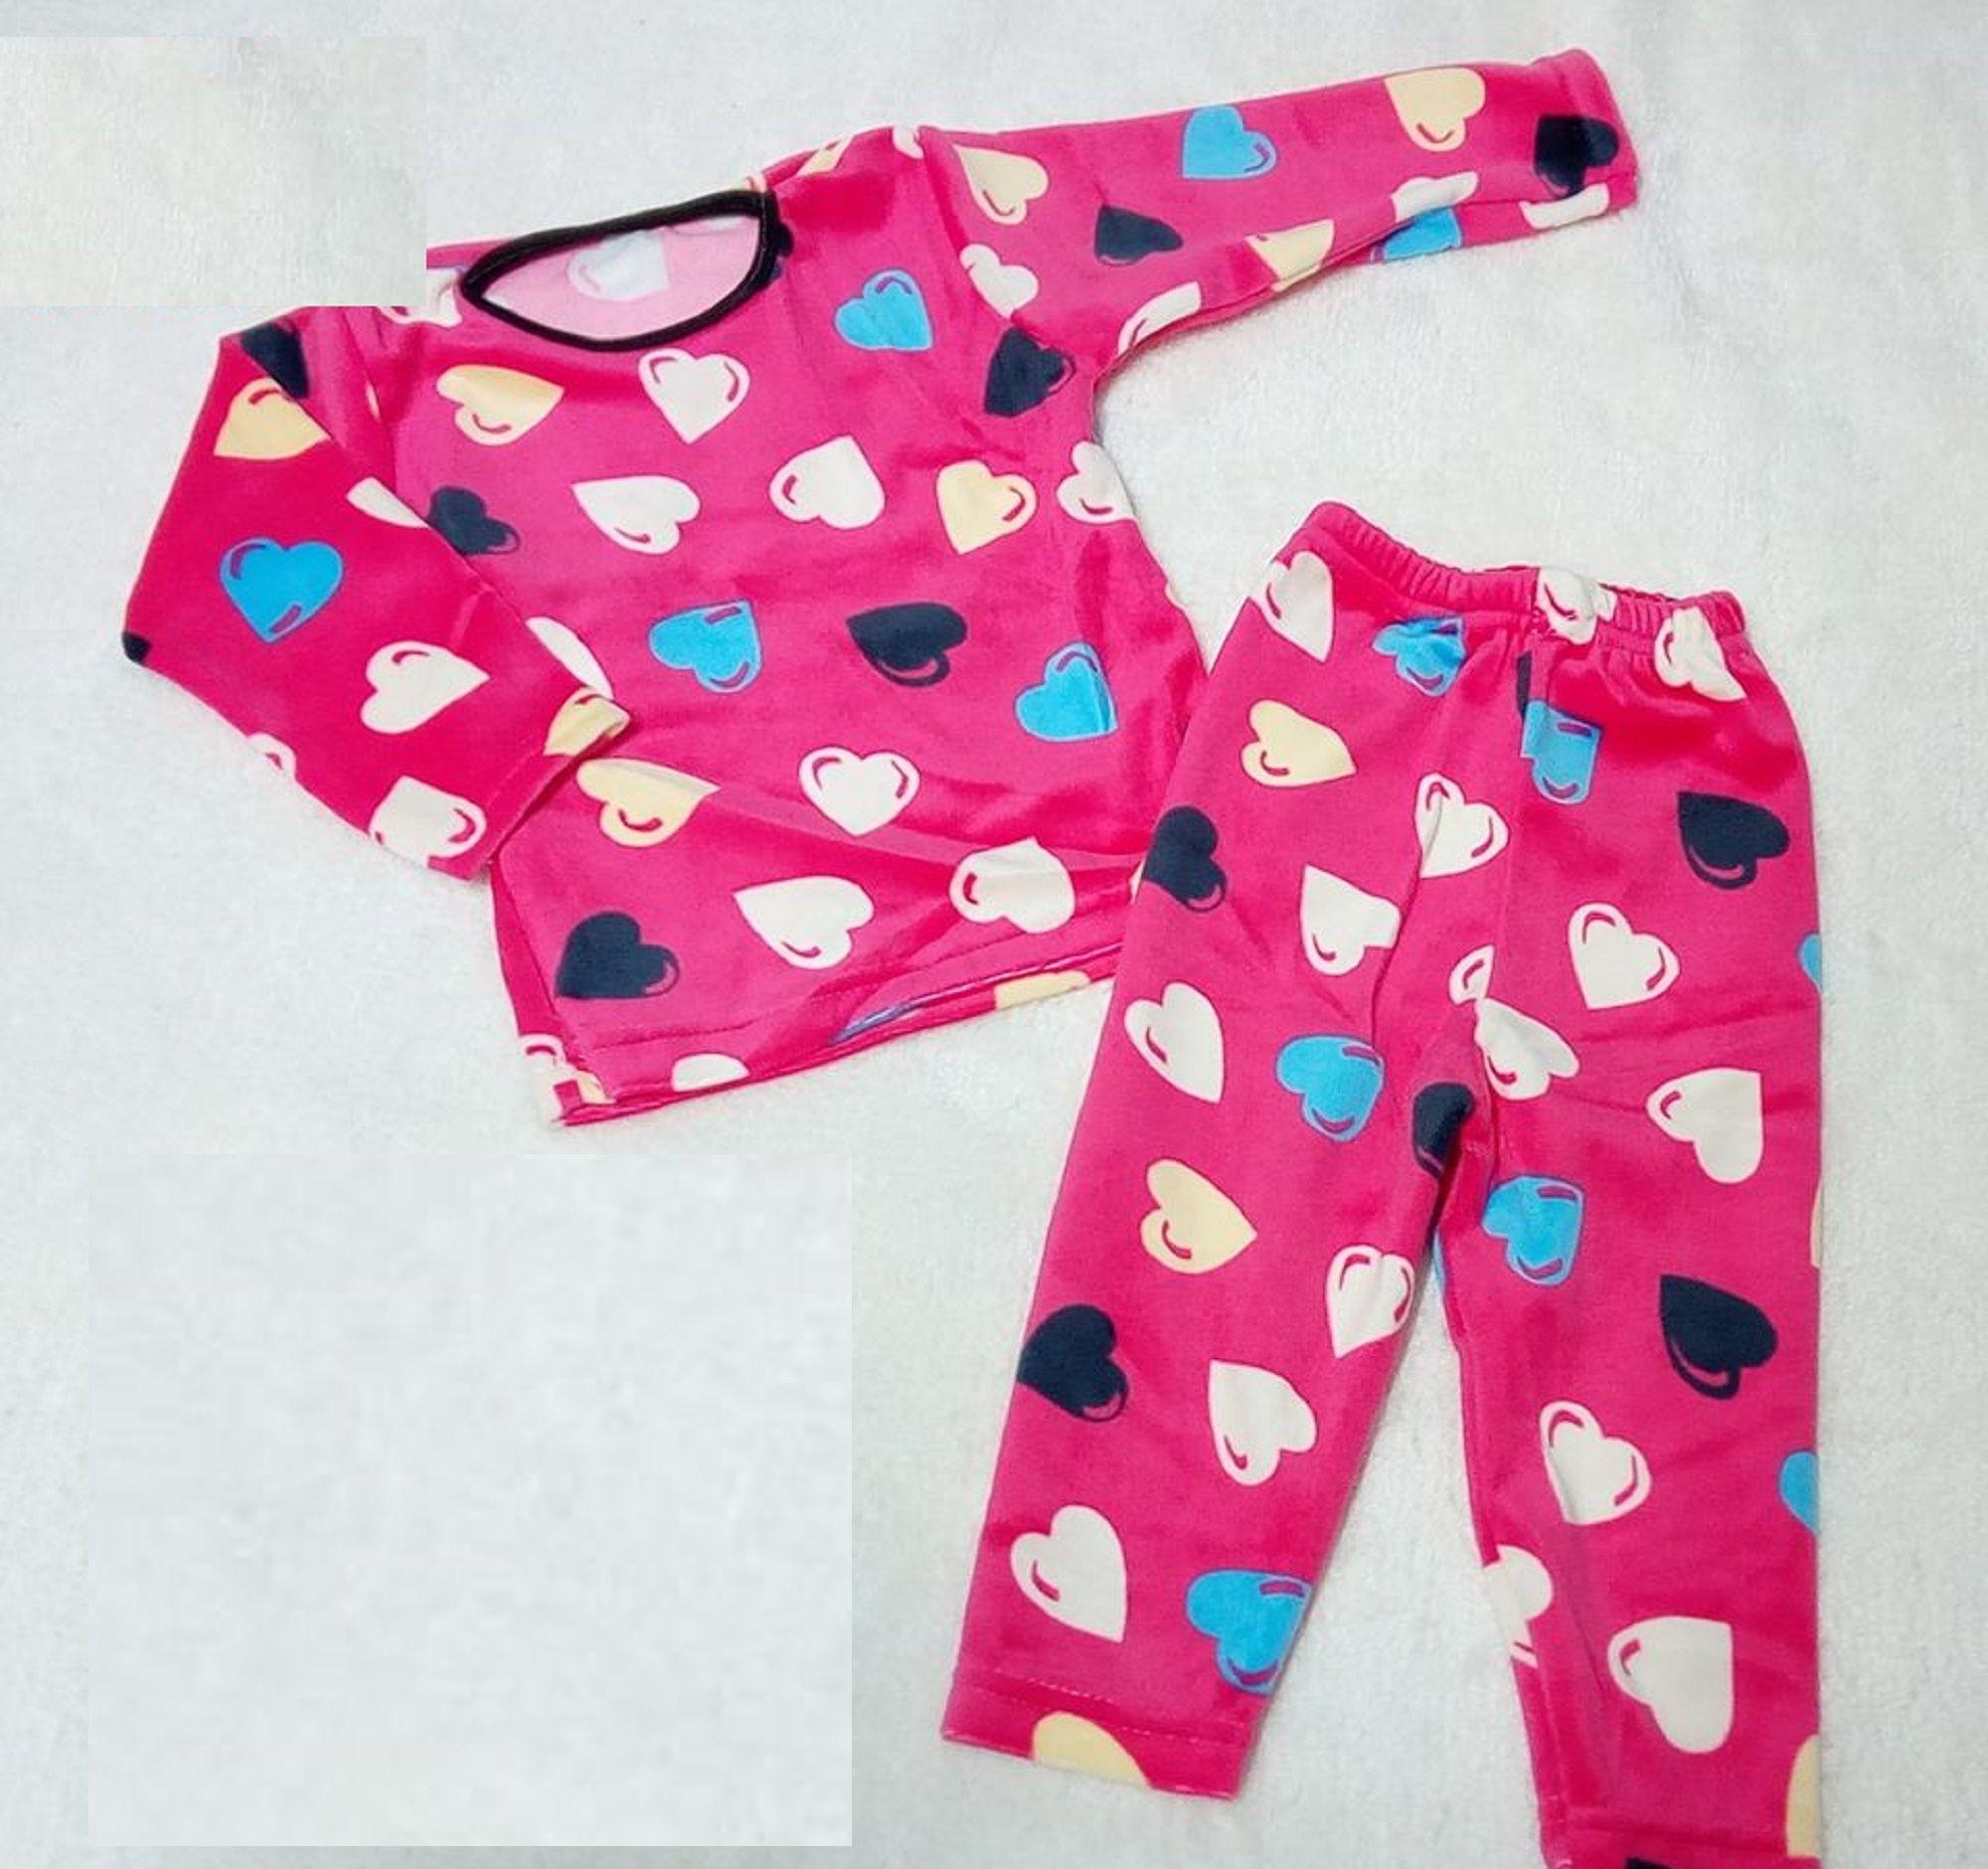 صورة دفايات اطفال ملابس , موديلات جديده دفايات اطفال